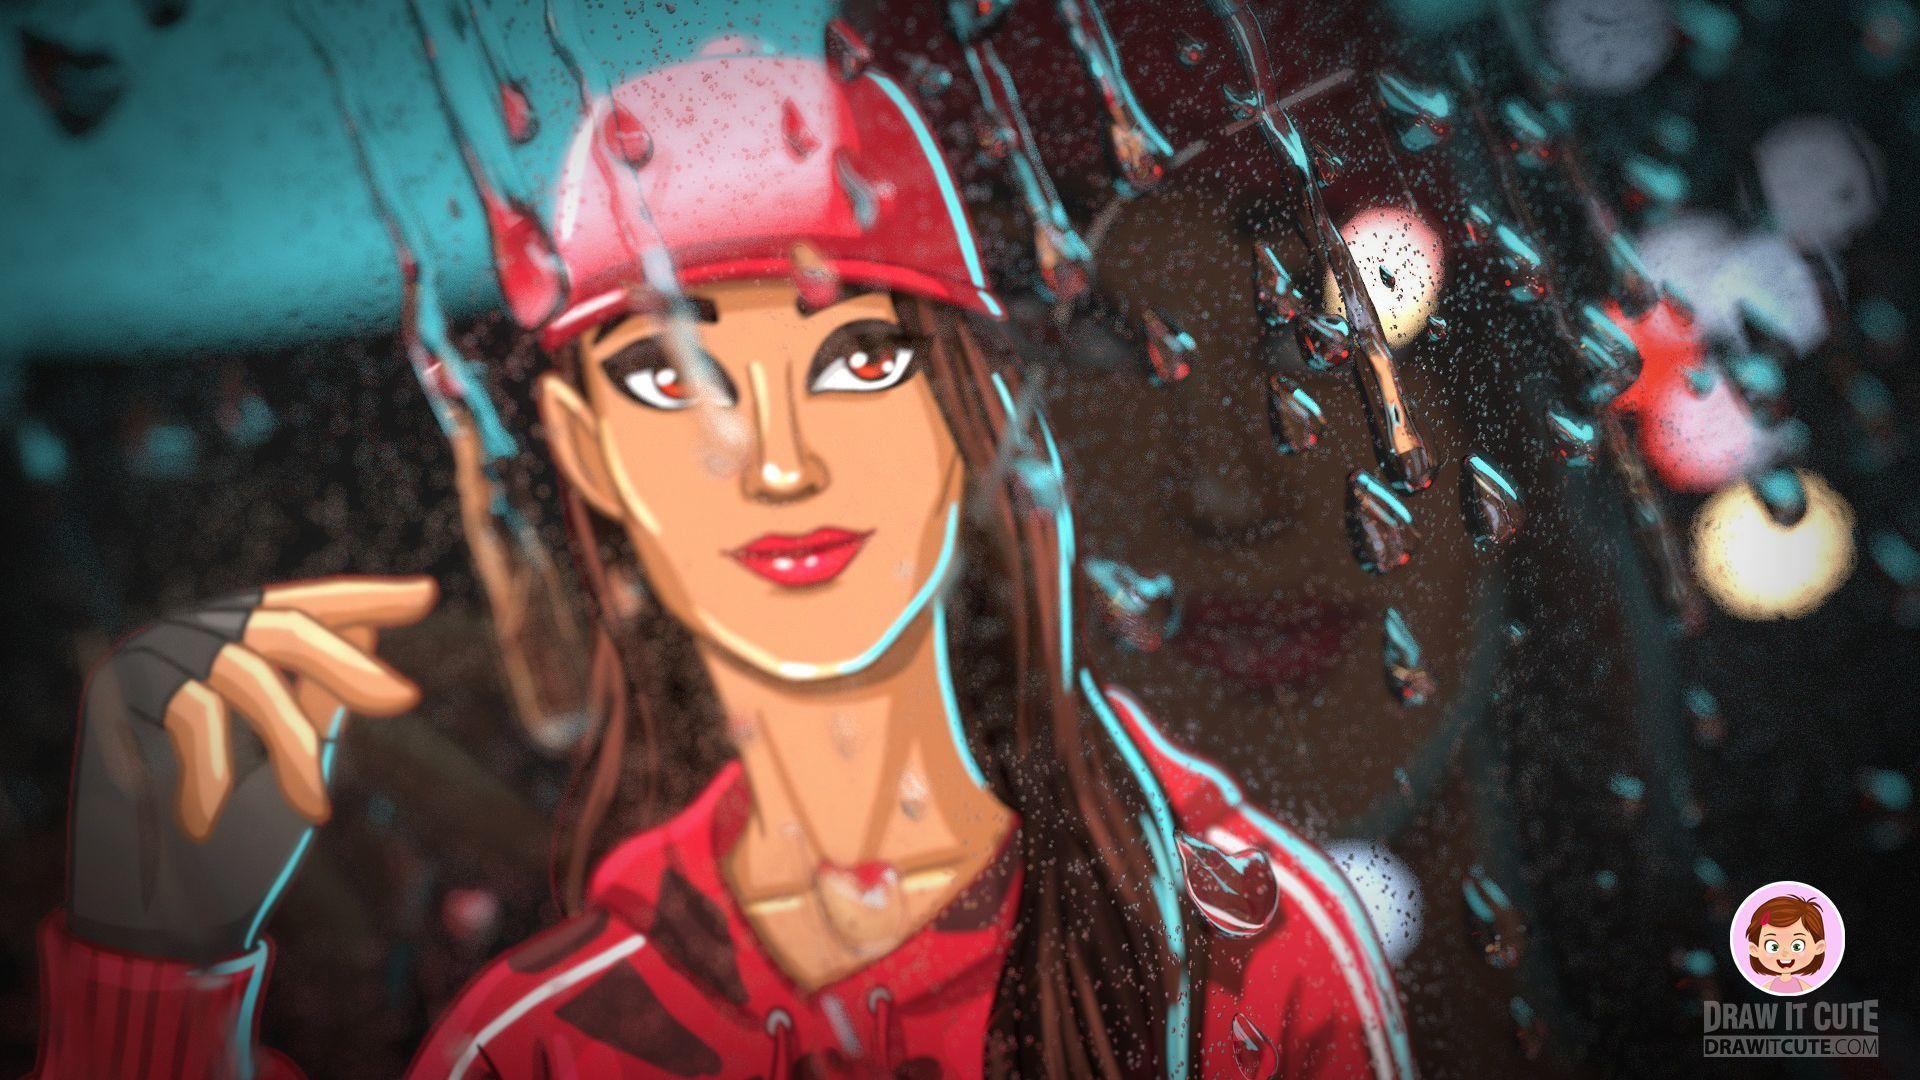 Ruby Fortnite Skin Wallpapers Top Free Ruby Fortnite Skin Backgrounds Wallpaperaccess